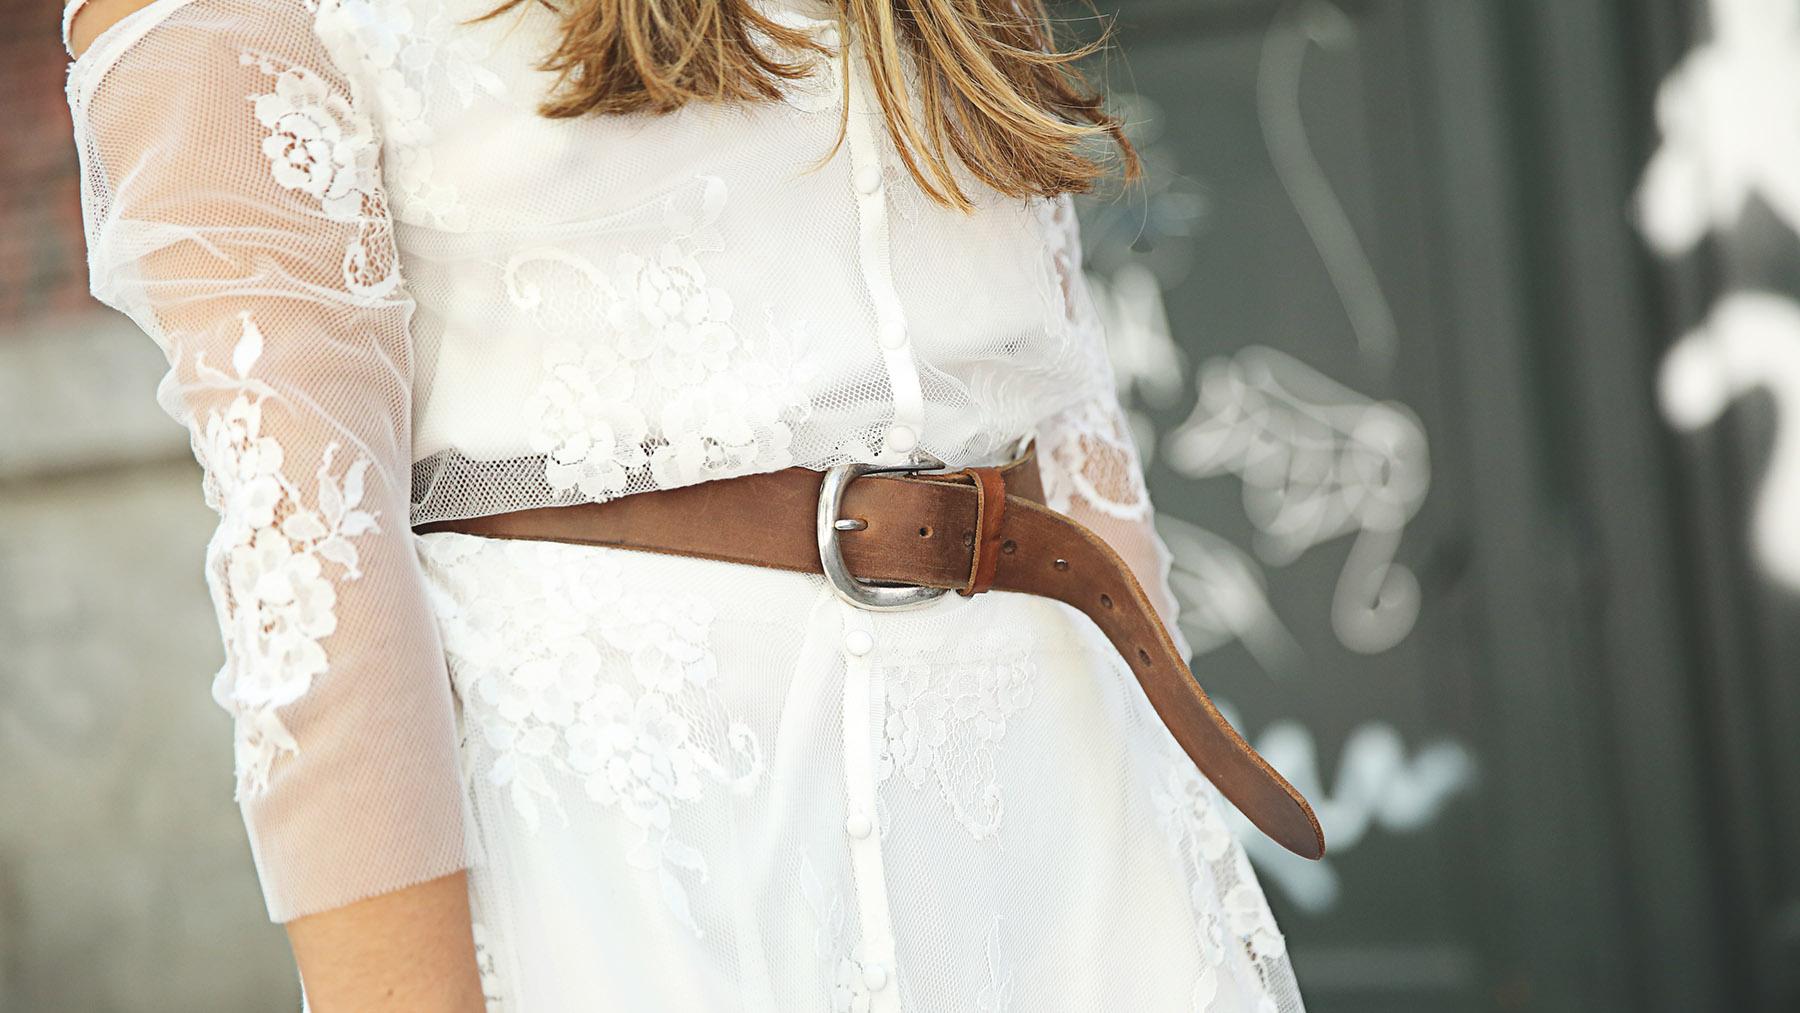 trendy-taste-look-outfit-street-style-ootd-blog-blogger-fashiopn-spain-moda-españa-magnum-juana-acosta-maje-12